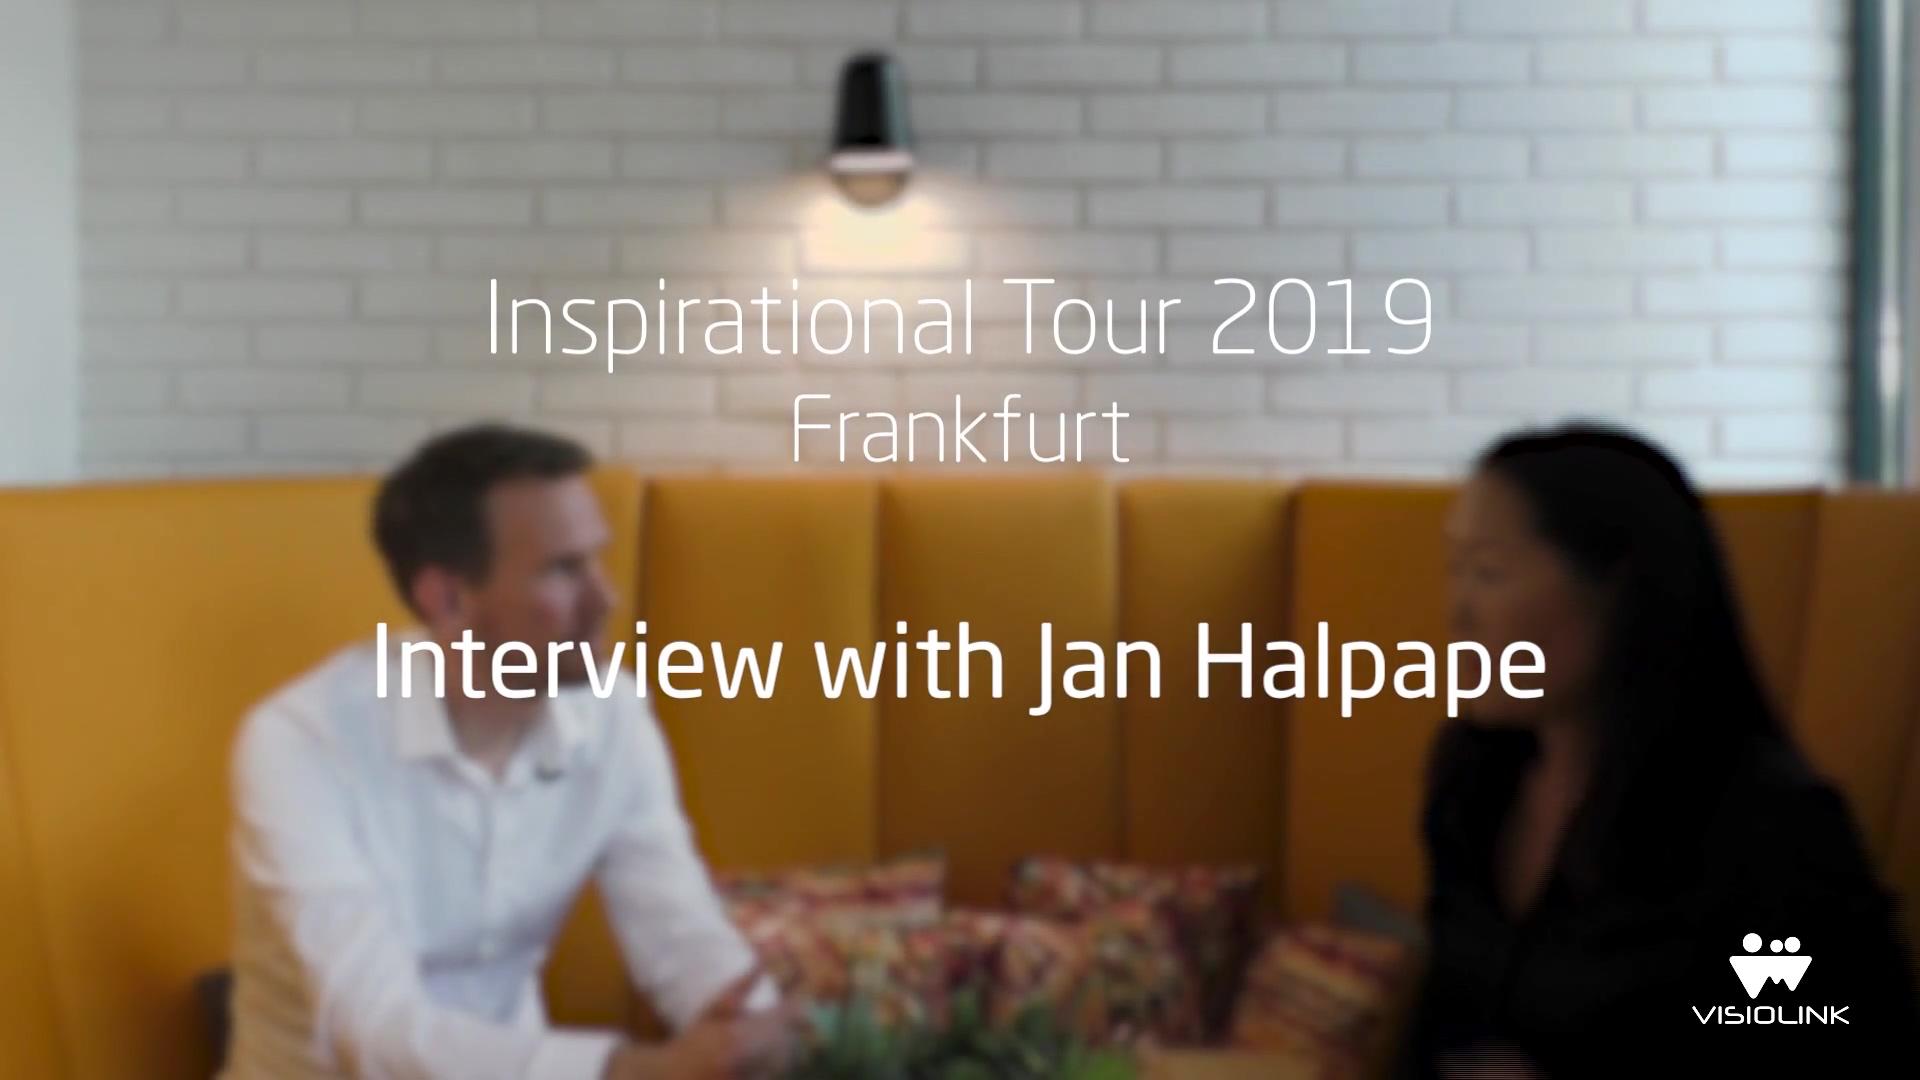 Jan Halpape_Interview IT2019.eng